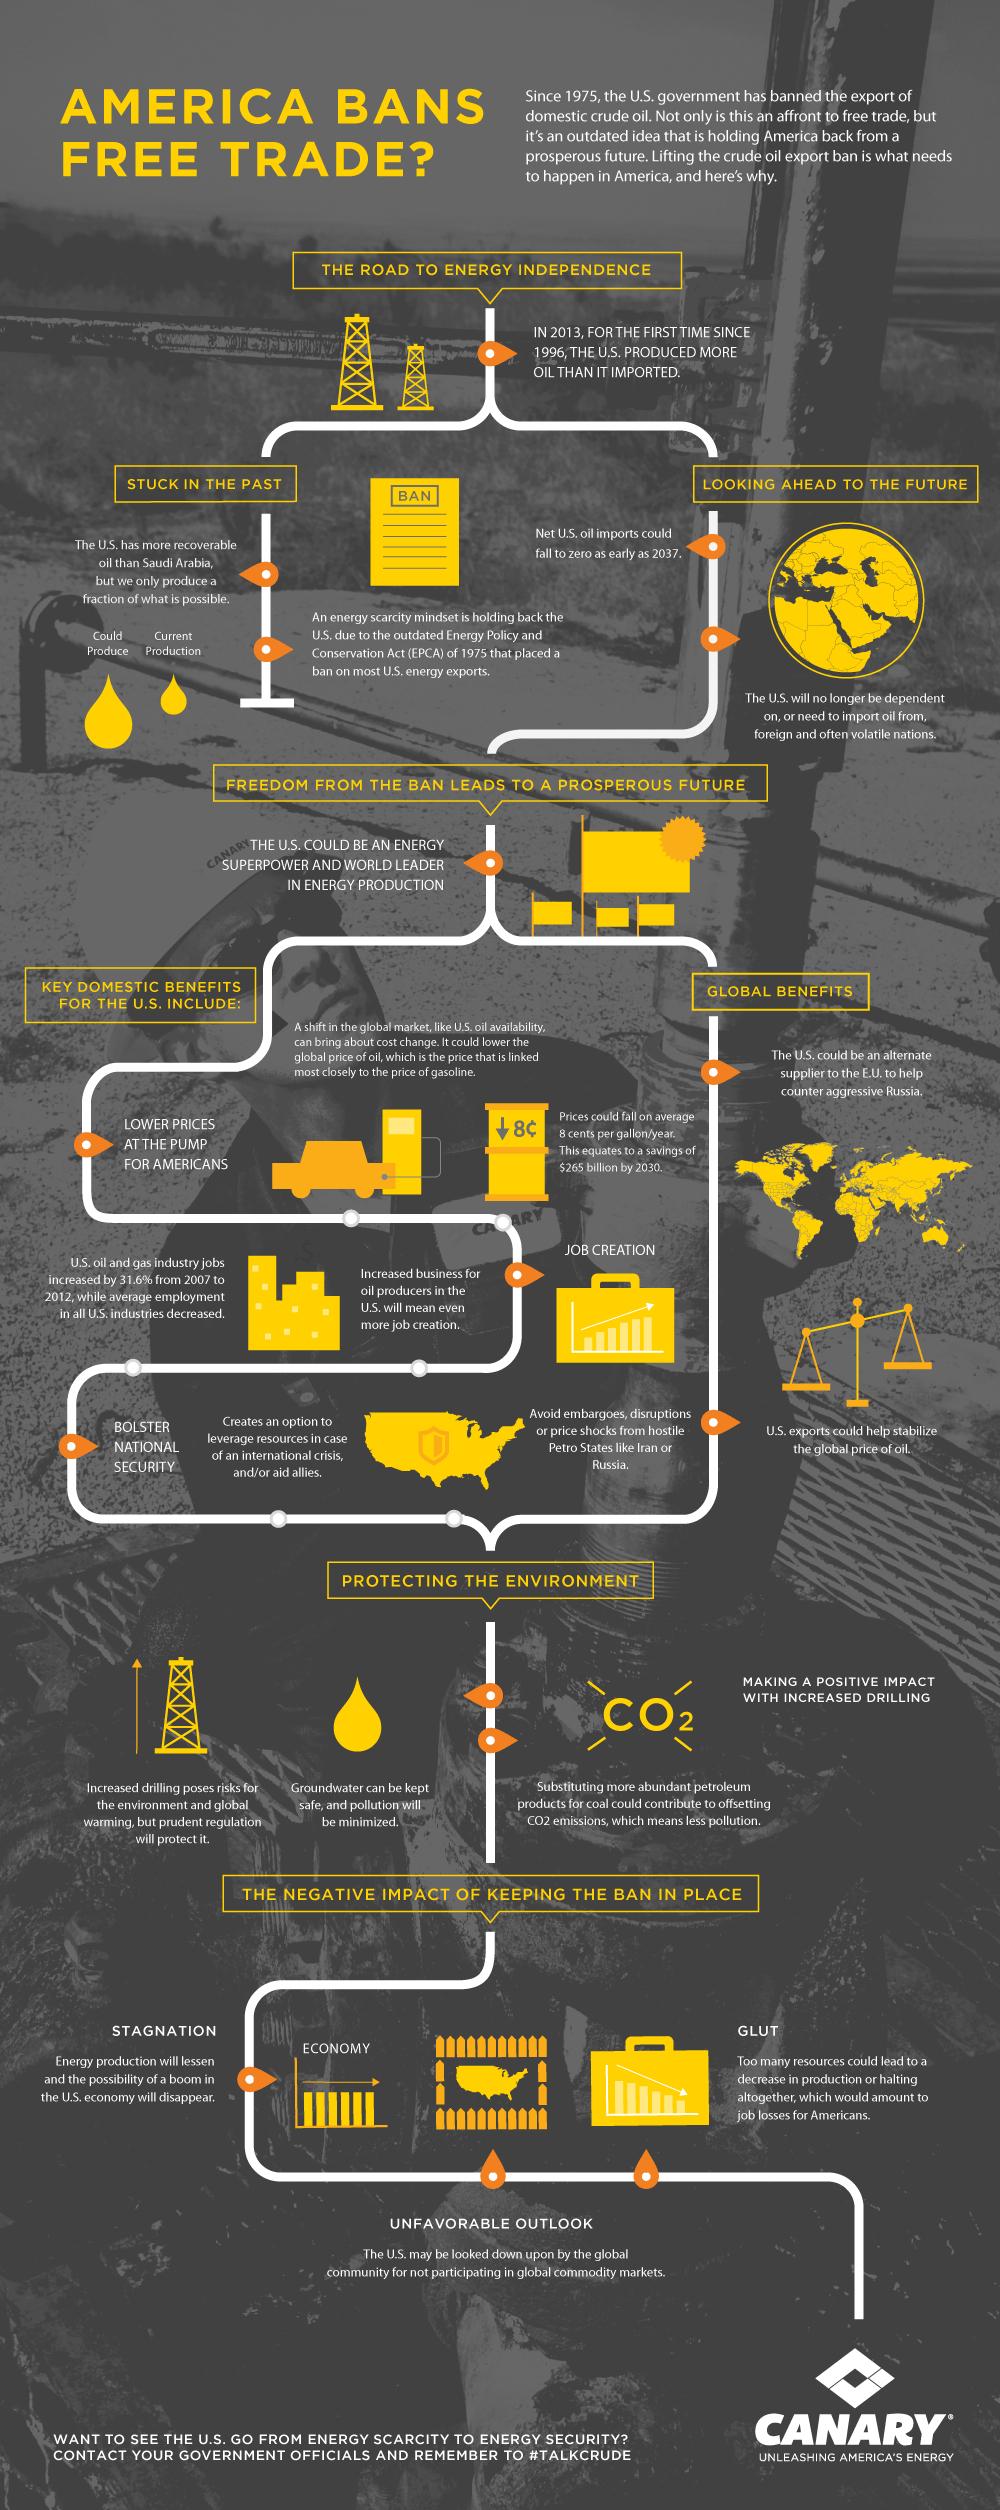 AmericaBansFreeTrade-Infographic_NEW141008